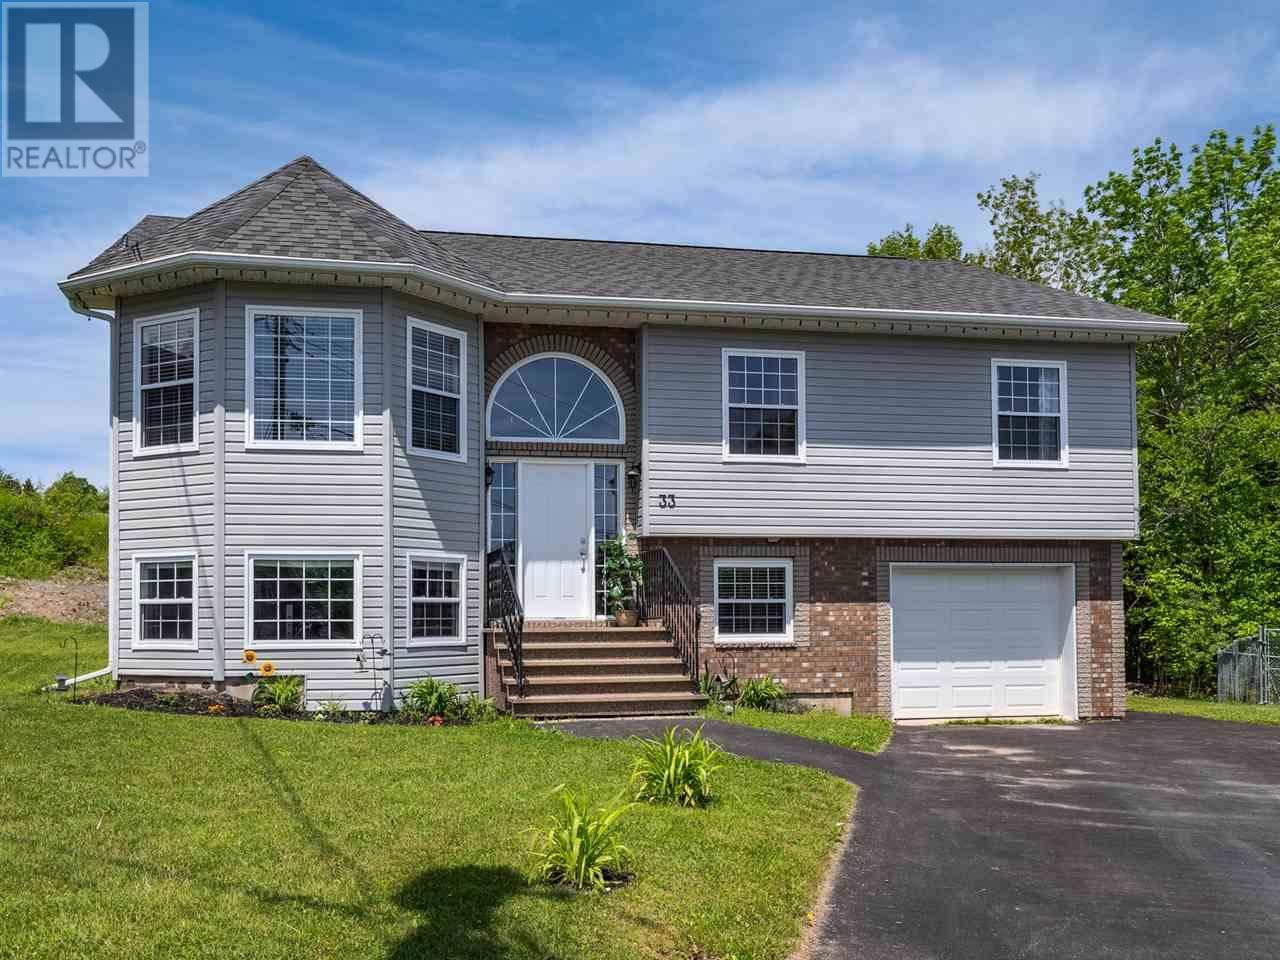 House for sale at 33 Guptill Cs Beaver Bank Nova Scotia - MLS: 201914572